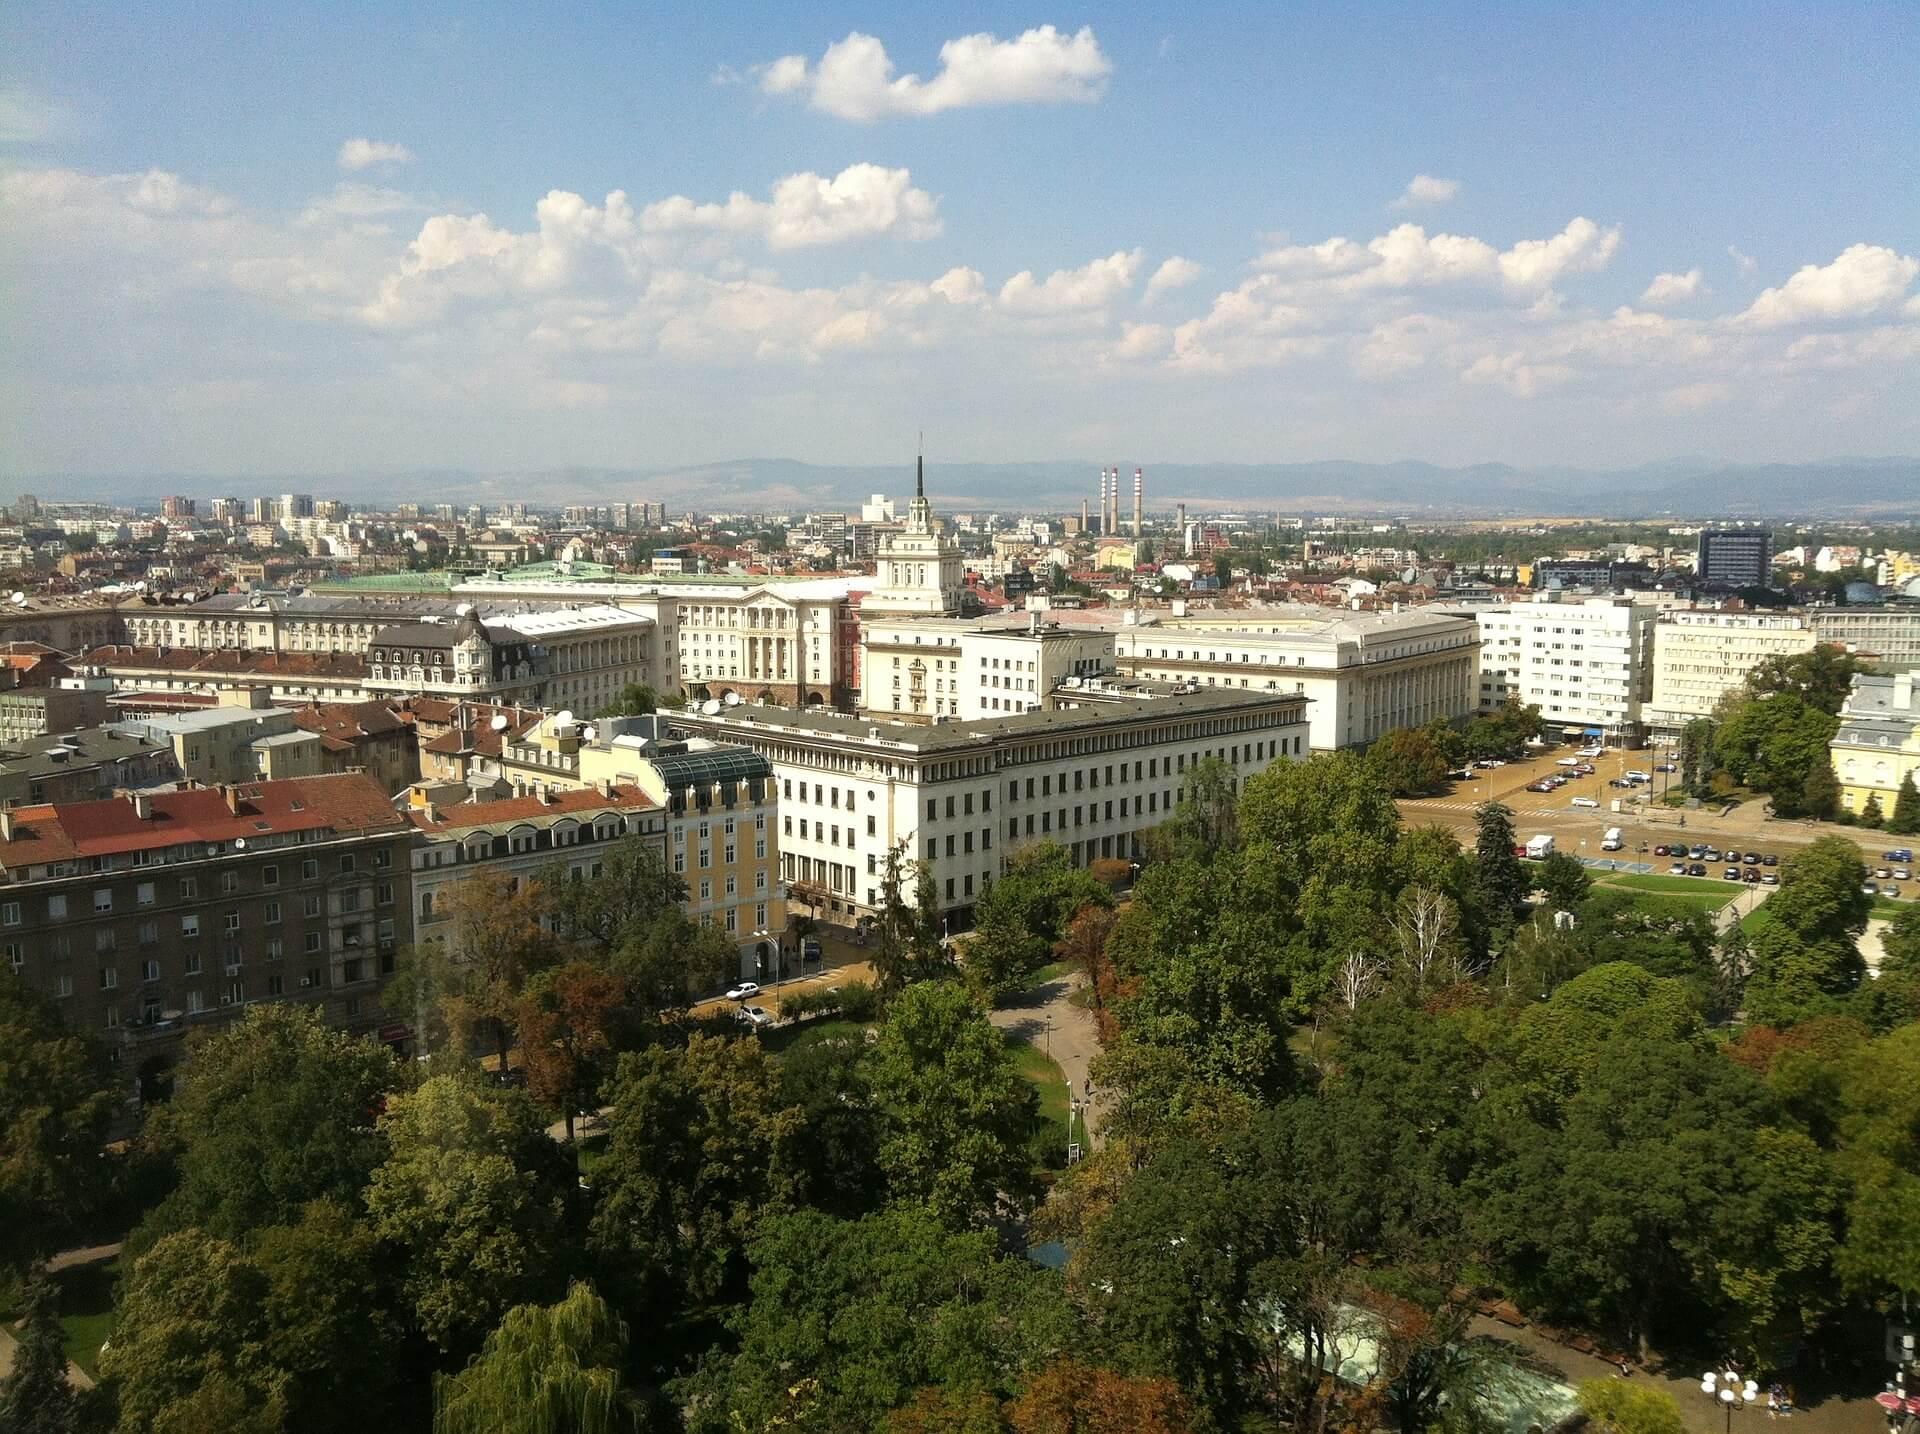 Direktflüge ab Basel nach Sofia